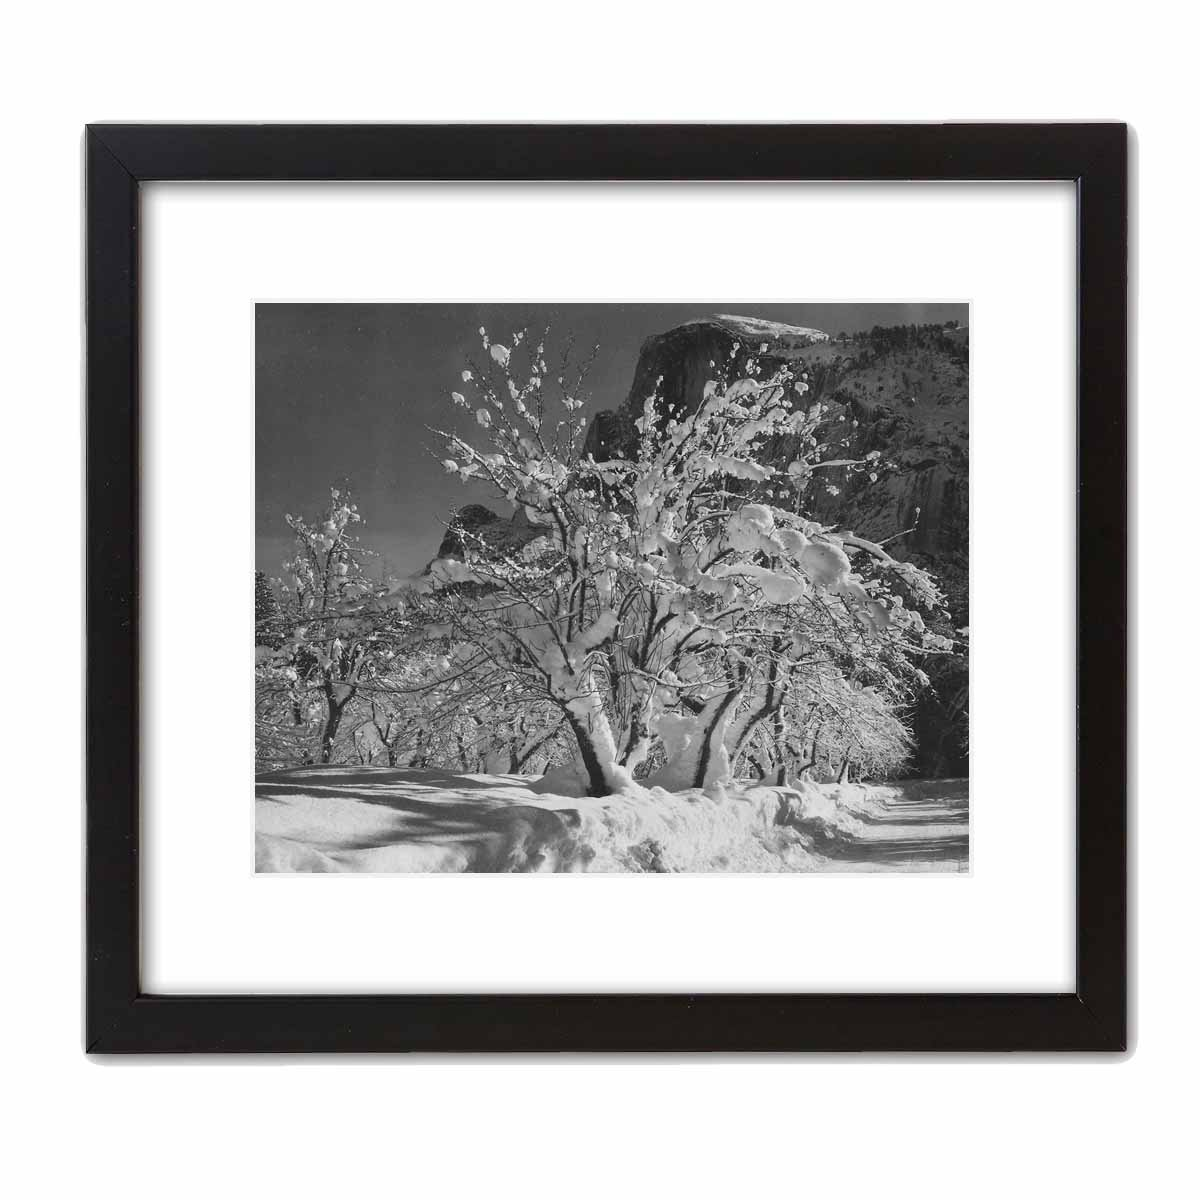 Amazon com artdash ansel adams by studios iconic black x10 w black frame photographs